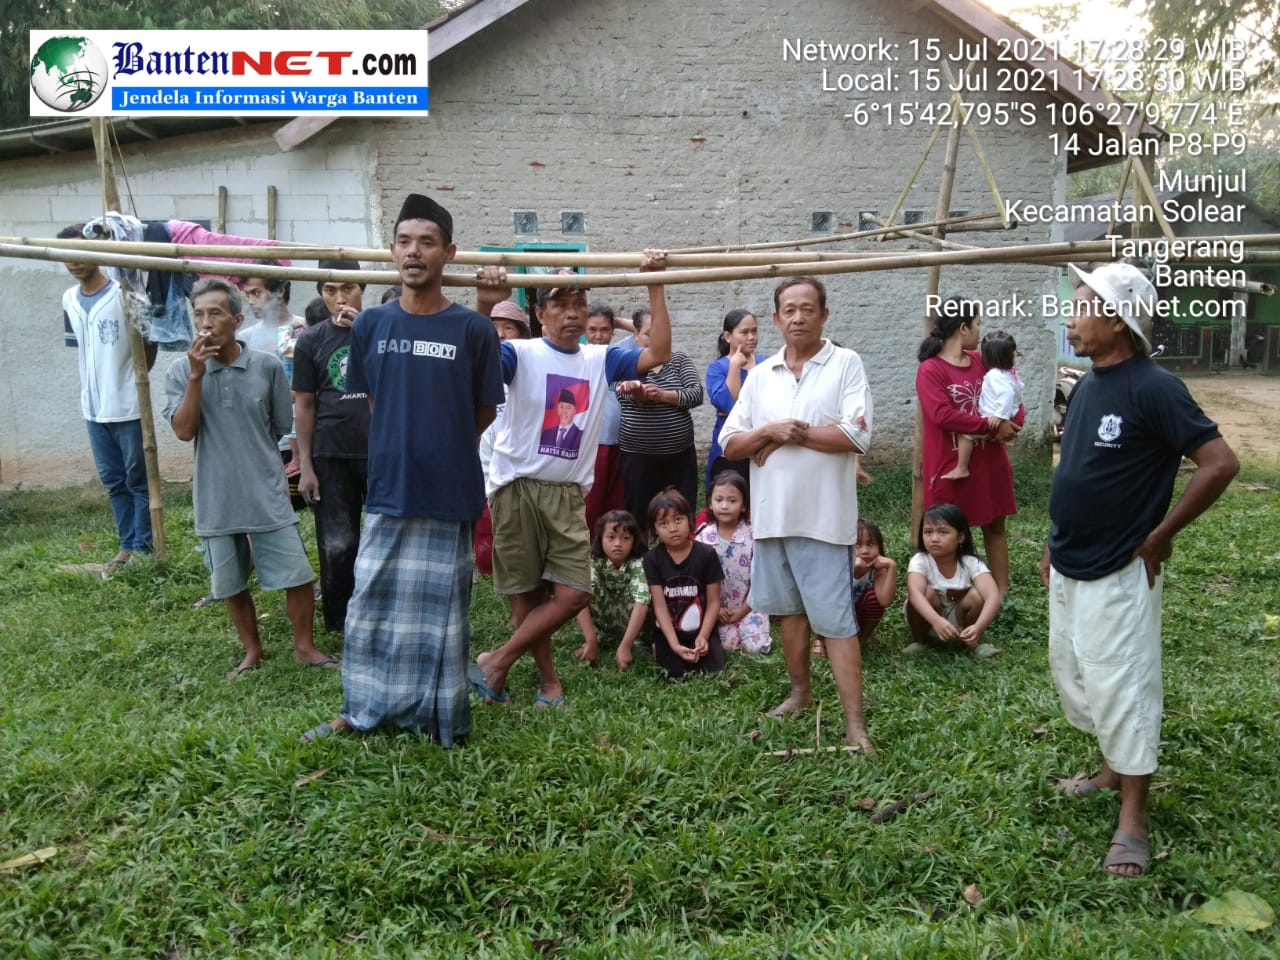 DPPP di Anggap Berbohong Terkait Kegiatan SAB Yang di Pindahkan, Warga Kp Leungsir Tetap Menuntut